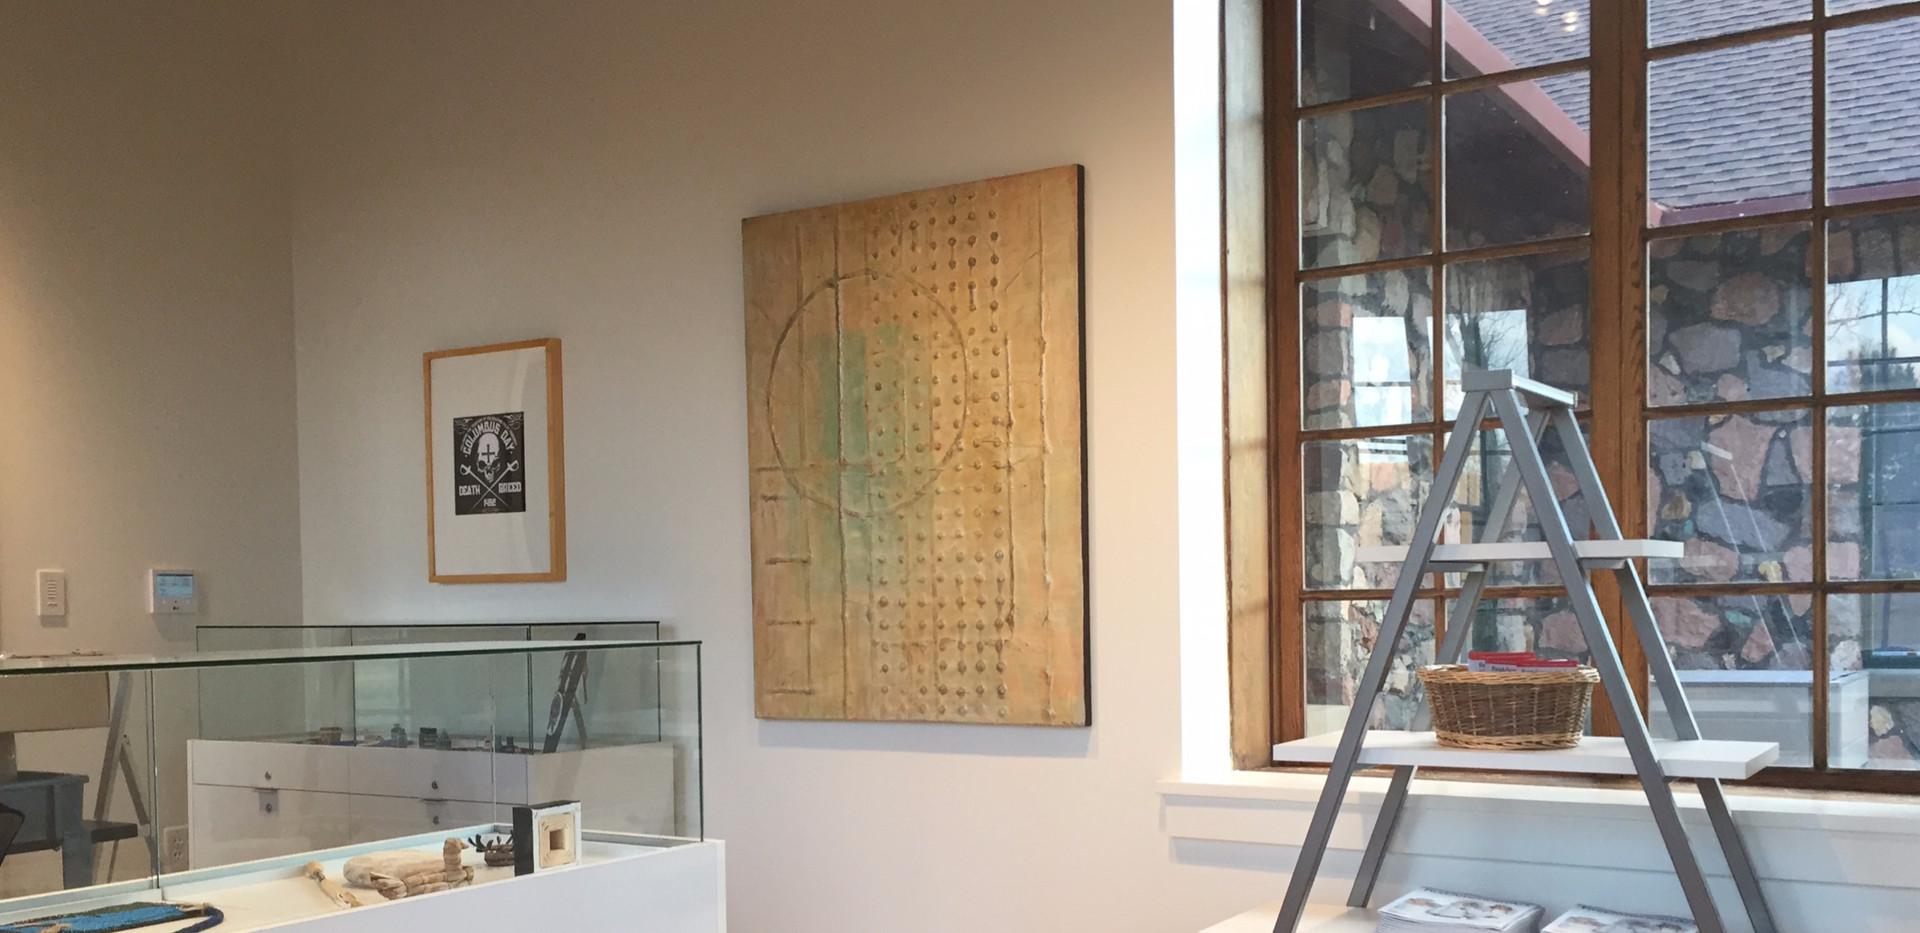 Wa-Pai-Shone Gallery